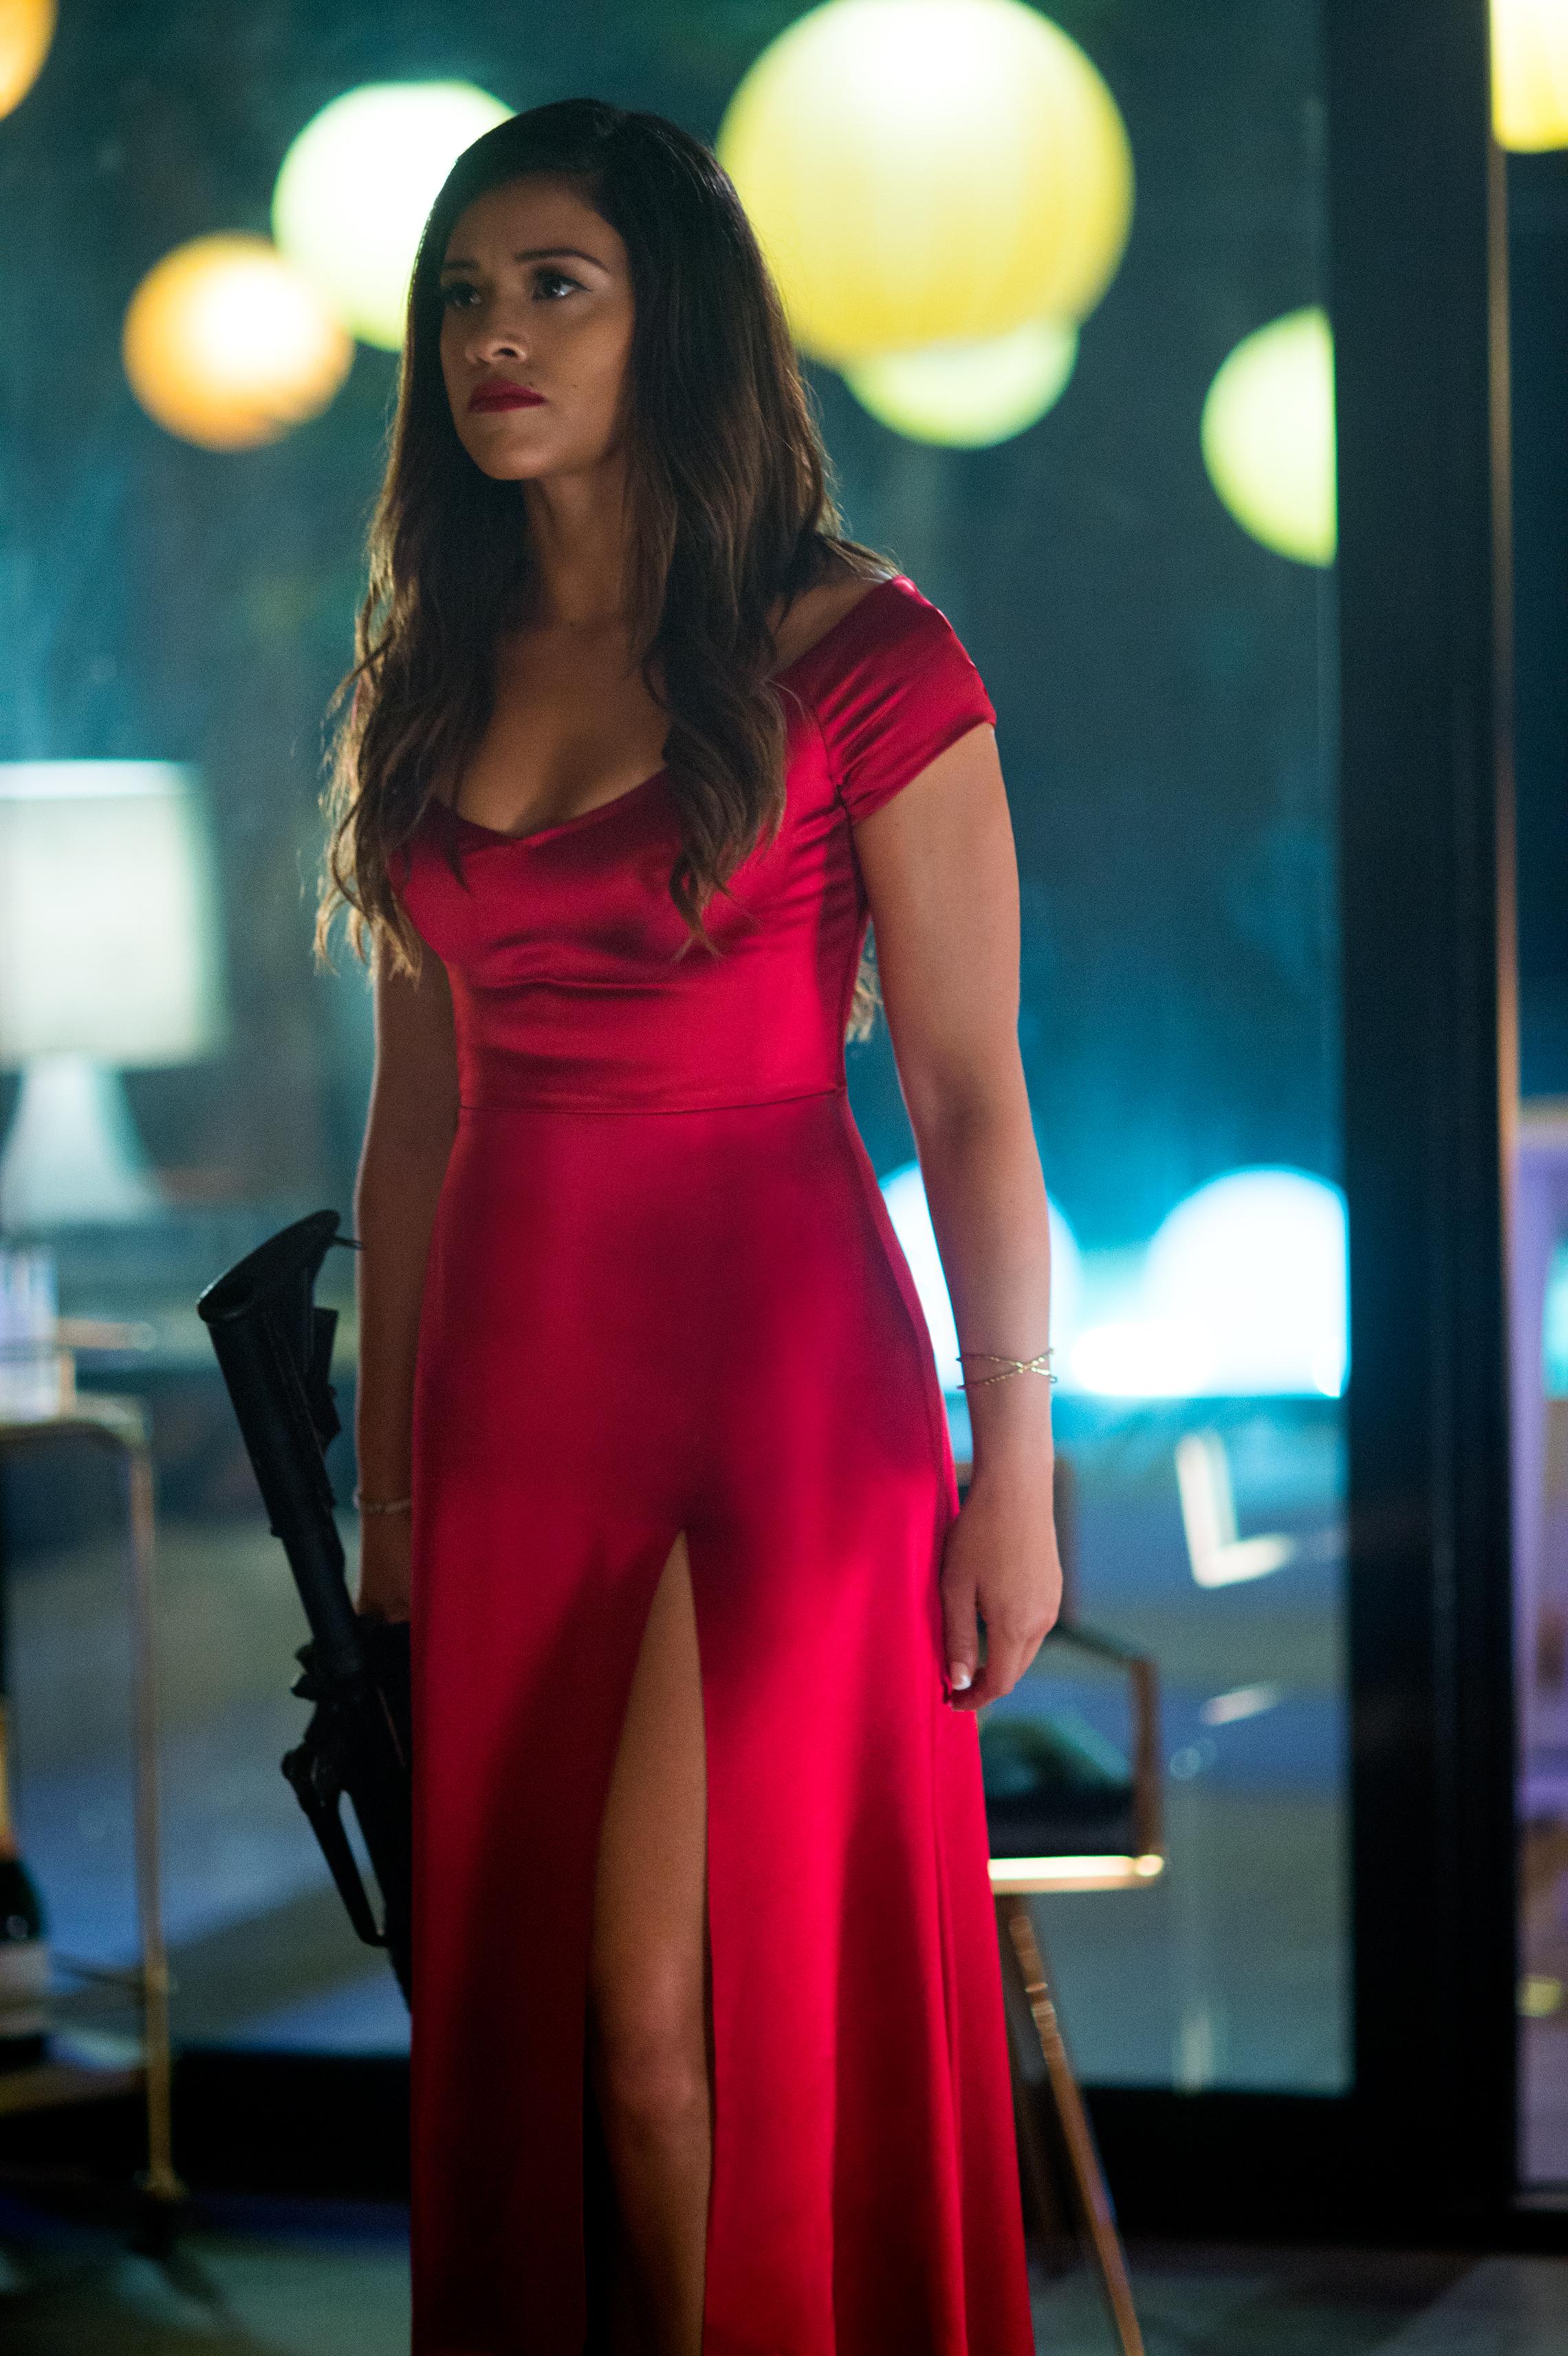 Gina Rodríguez en una escena de Miss Bala. / Foto: Sony Pictures